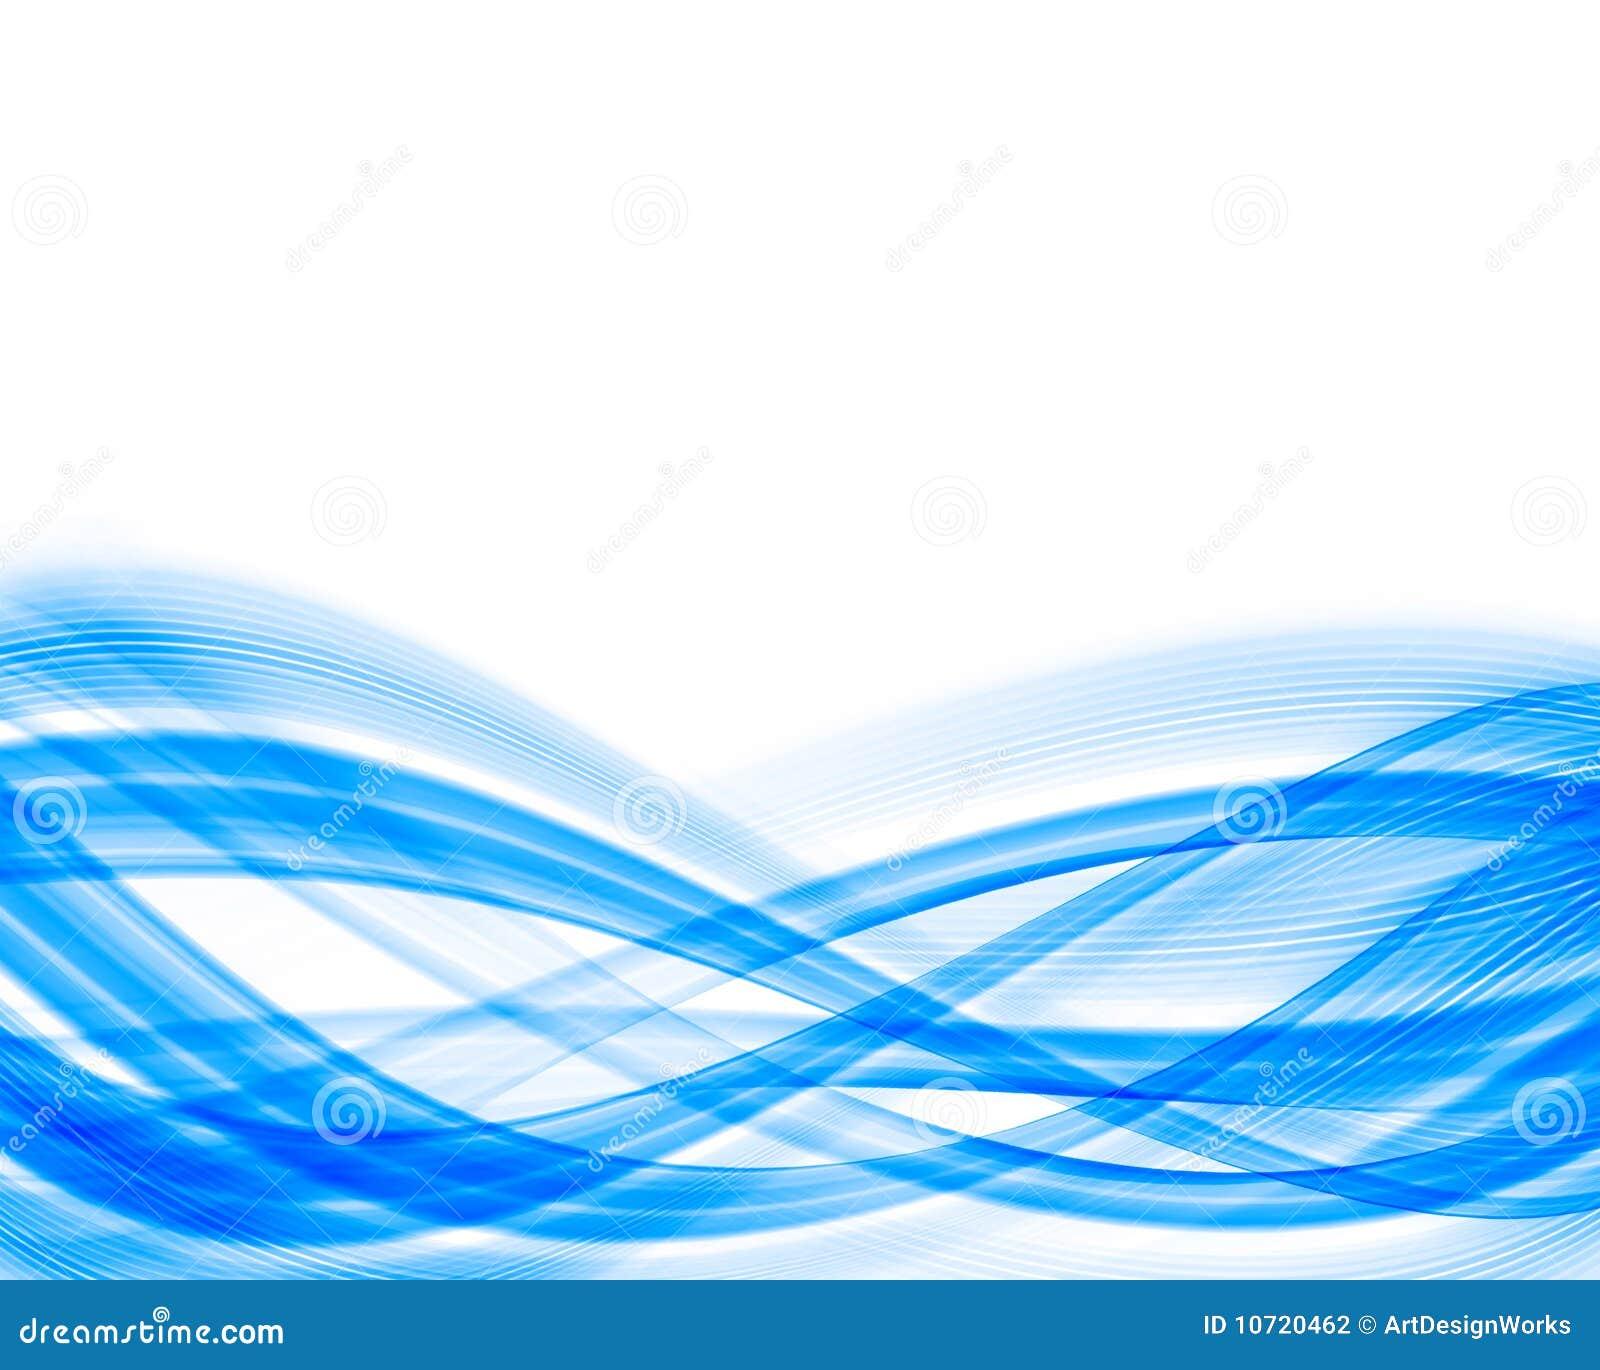 wavy blue background stock photography